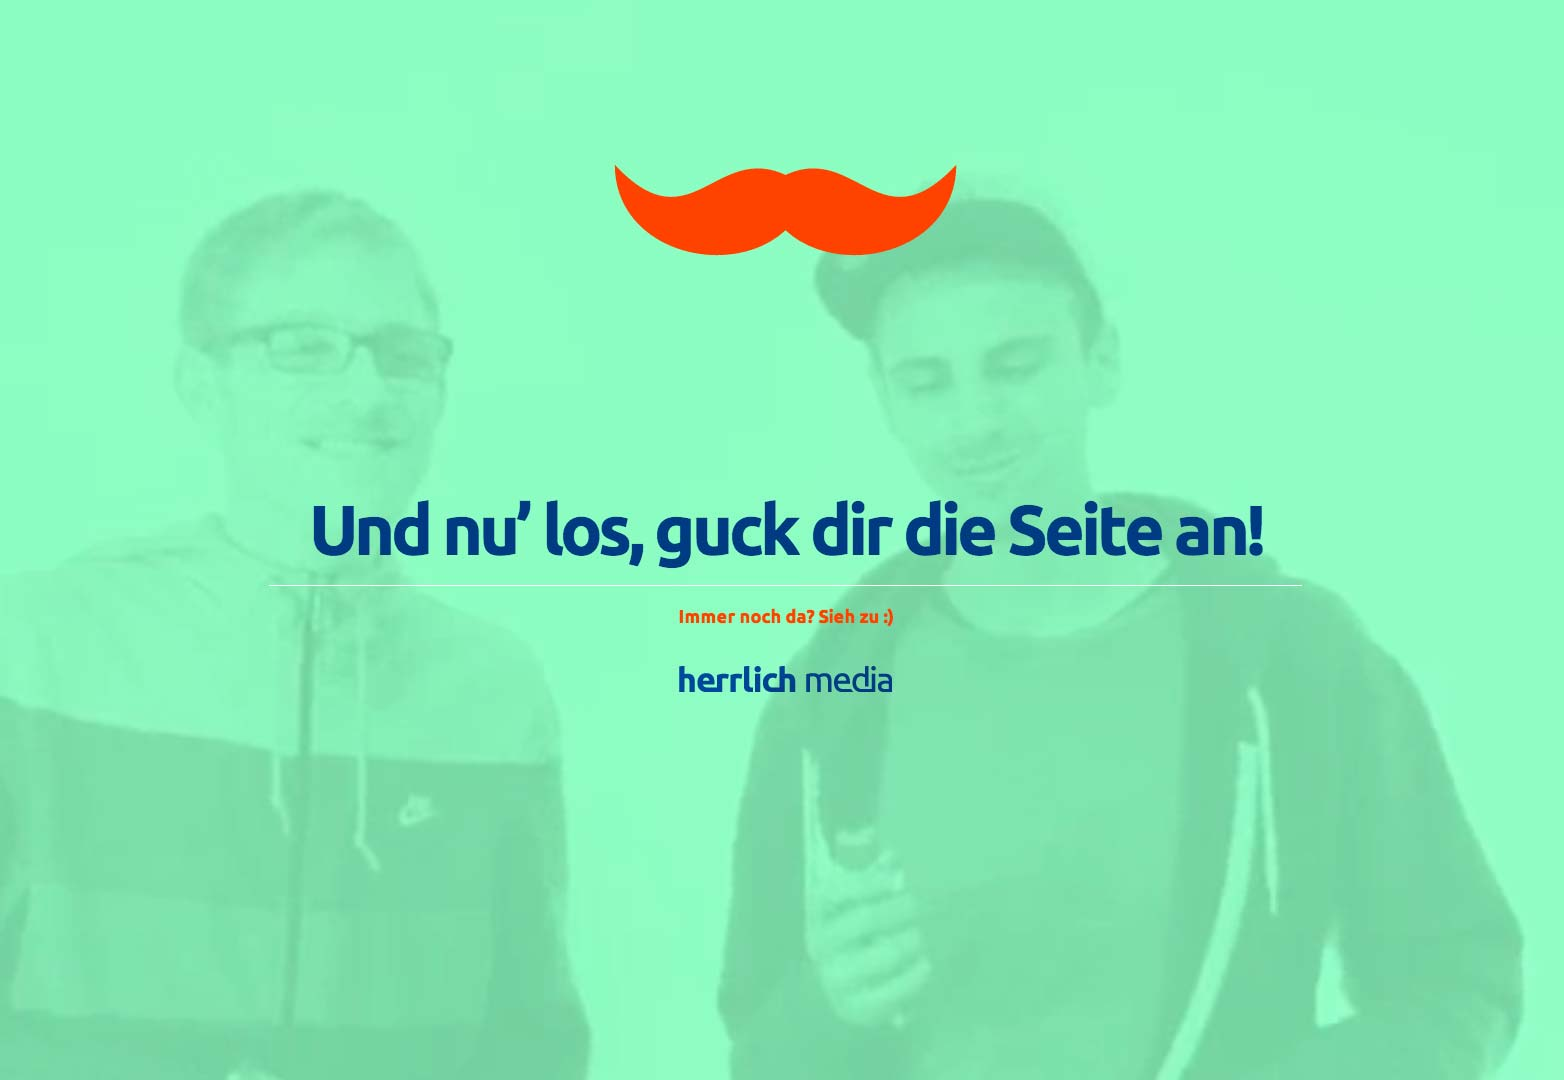 010_herrlich-media